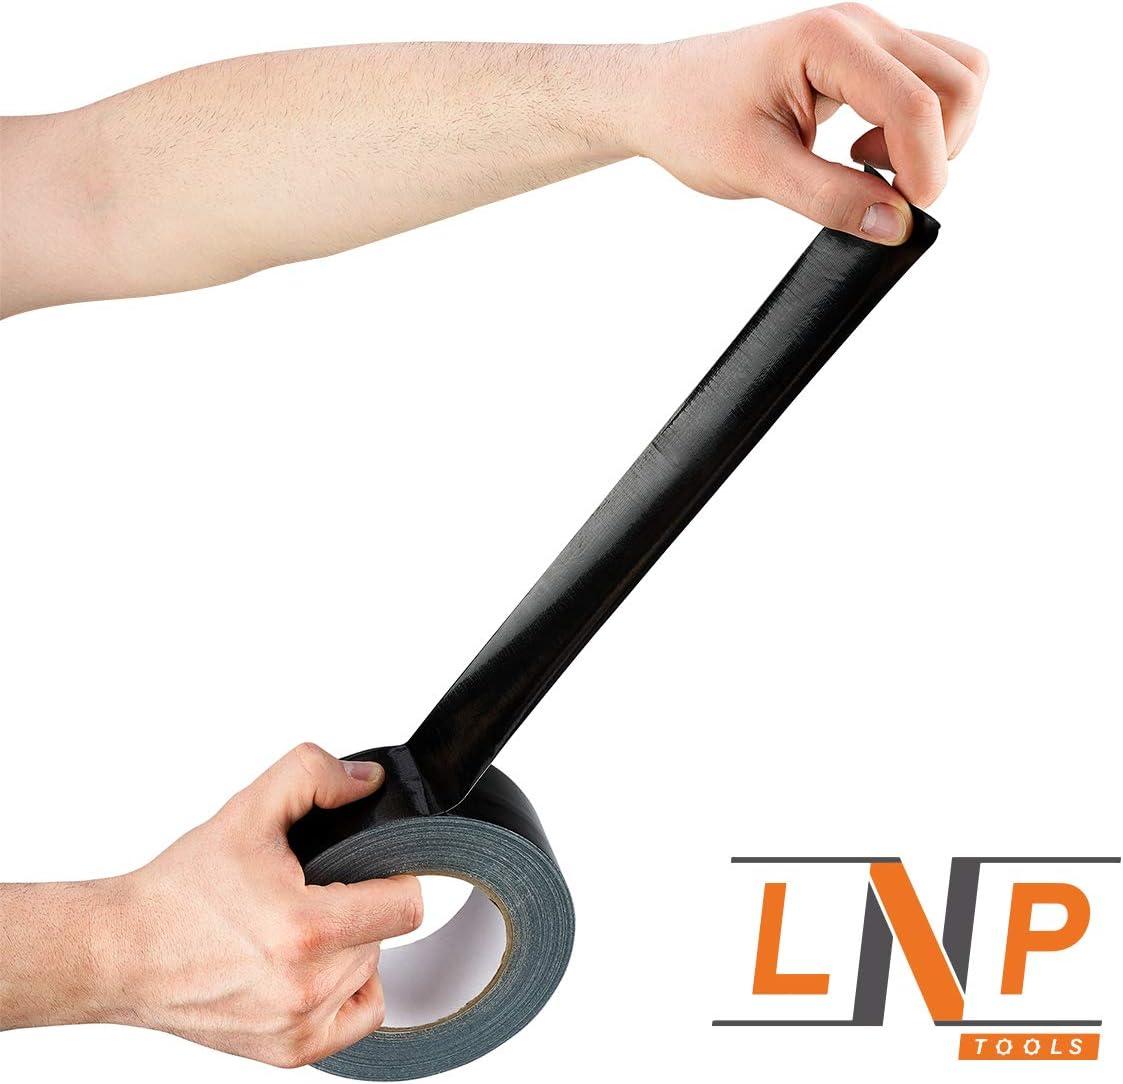 50m x 50mm Extra Stark LNP Tools Profi-Gewebeband 1er Pack f/ür alle Reparaturarbeiten